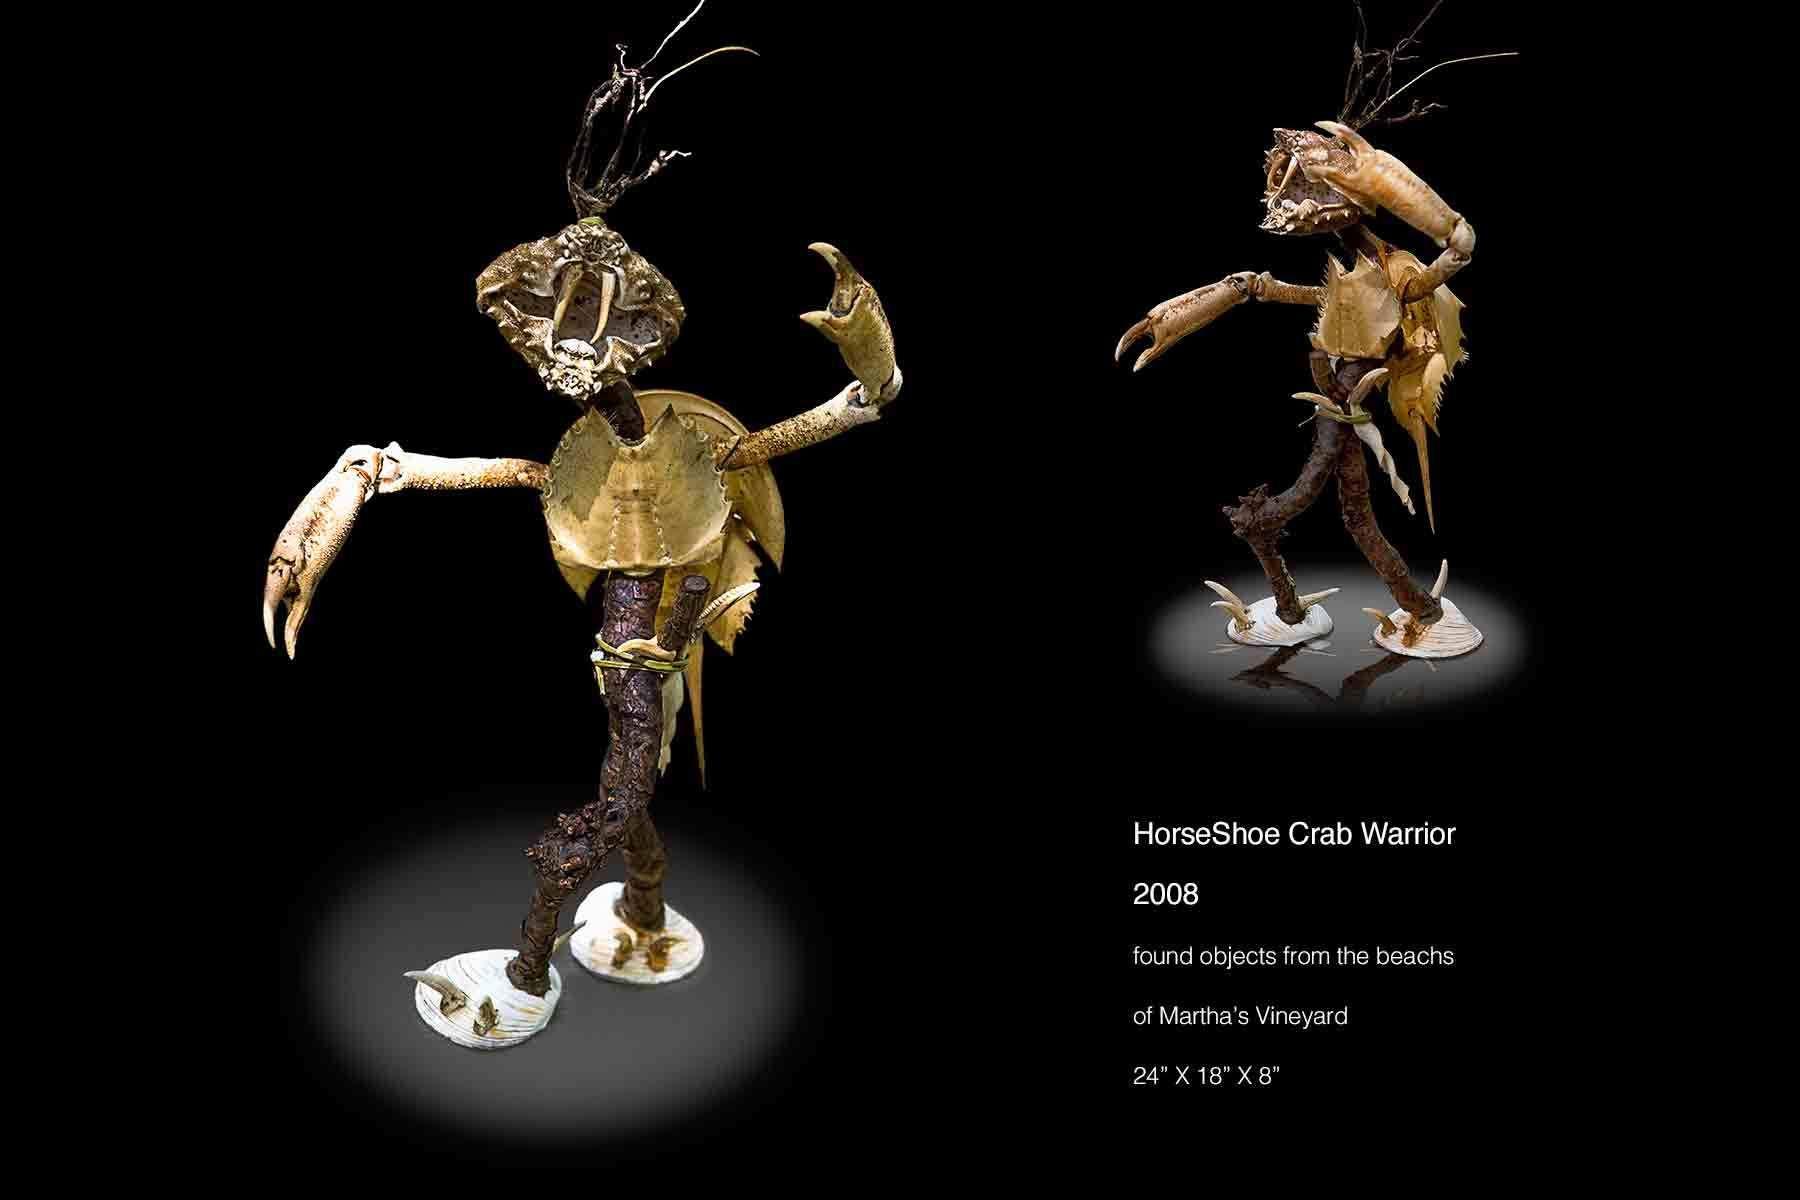 HorseShoe Crab Warrior